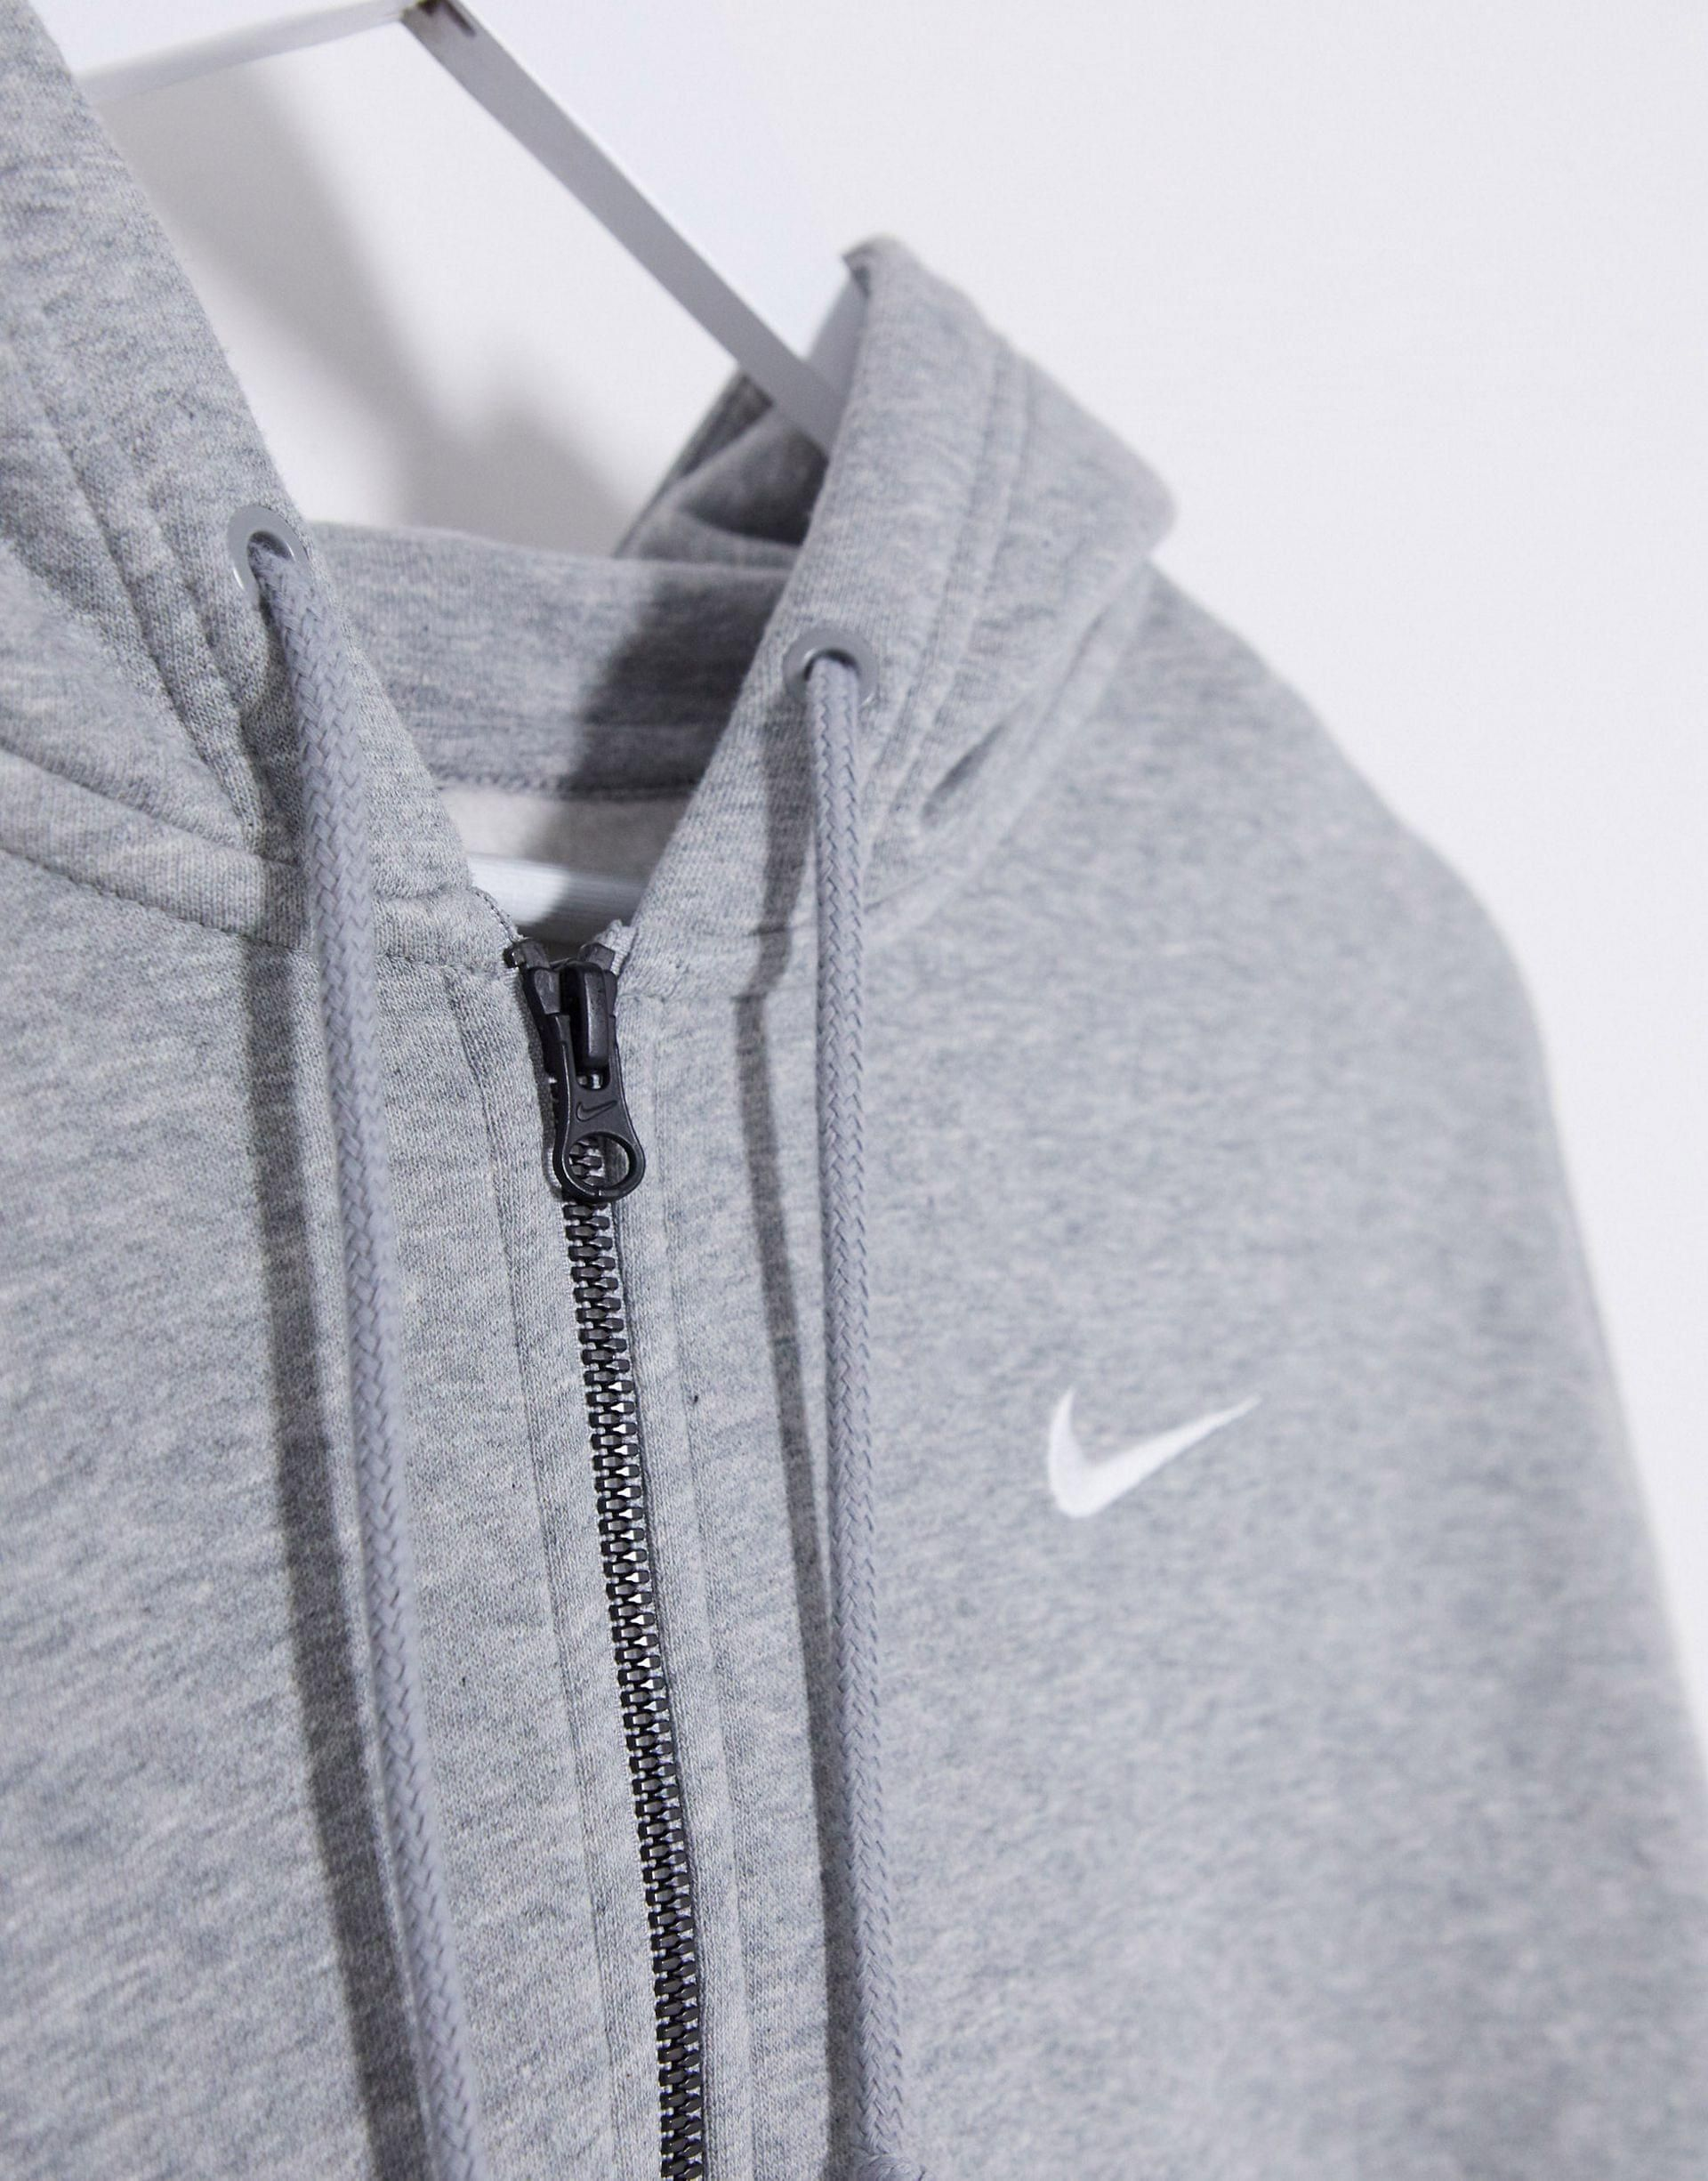 Nike Mini Swoosh Oversized Cropped Gray Zip Through Hoodie Grey Nike Jacket Oversized Hoodie Outfit Grey Jacket Outfit [ 2451 x 1920 Pixel ]